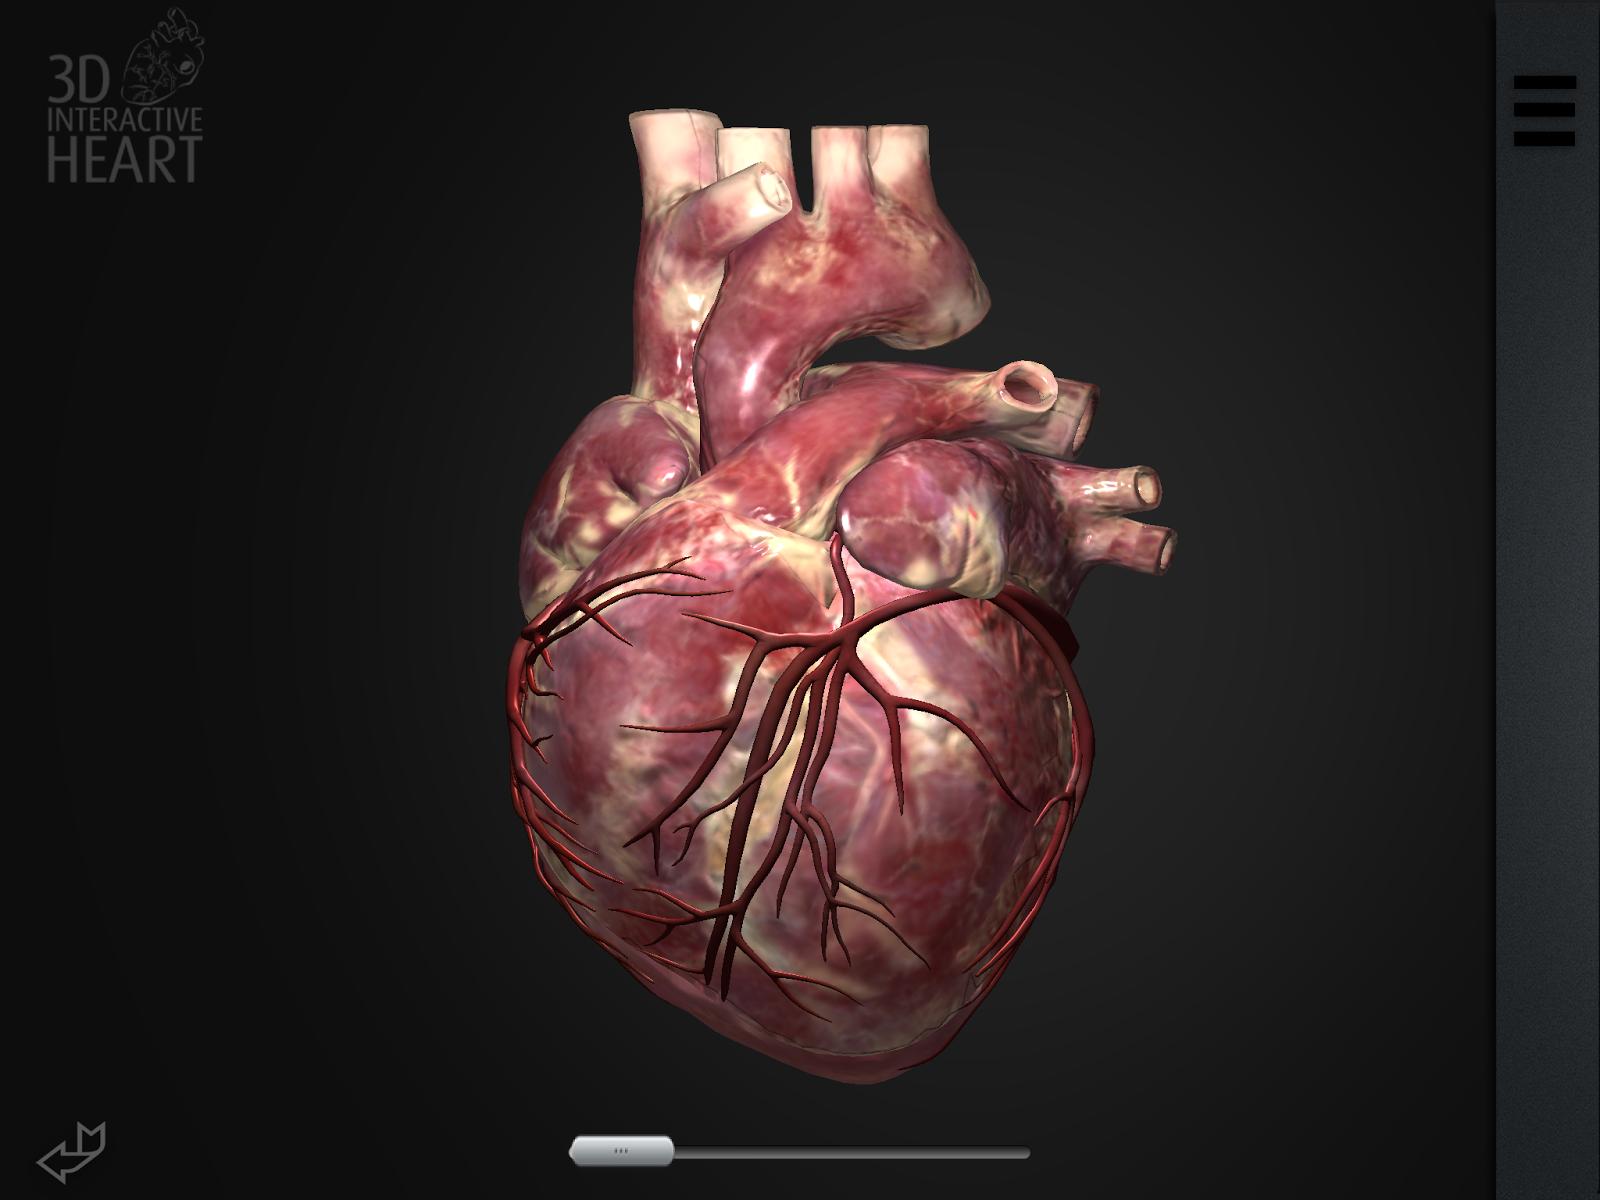 iPhone SDK: 3D Interactive Heart